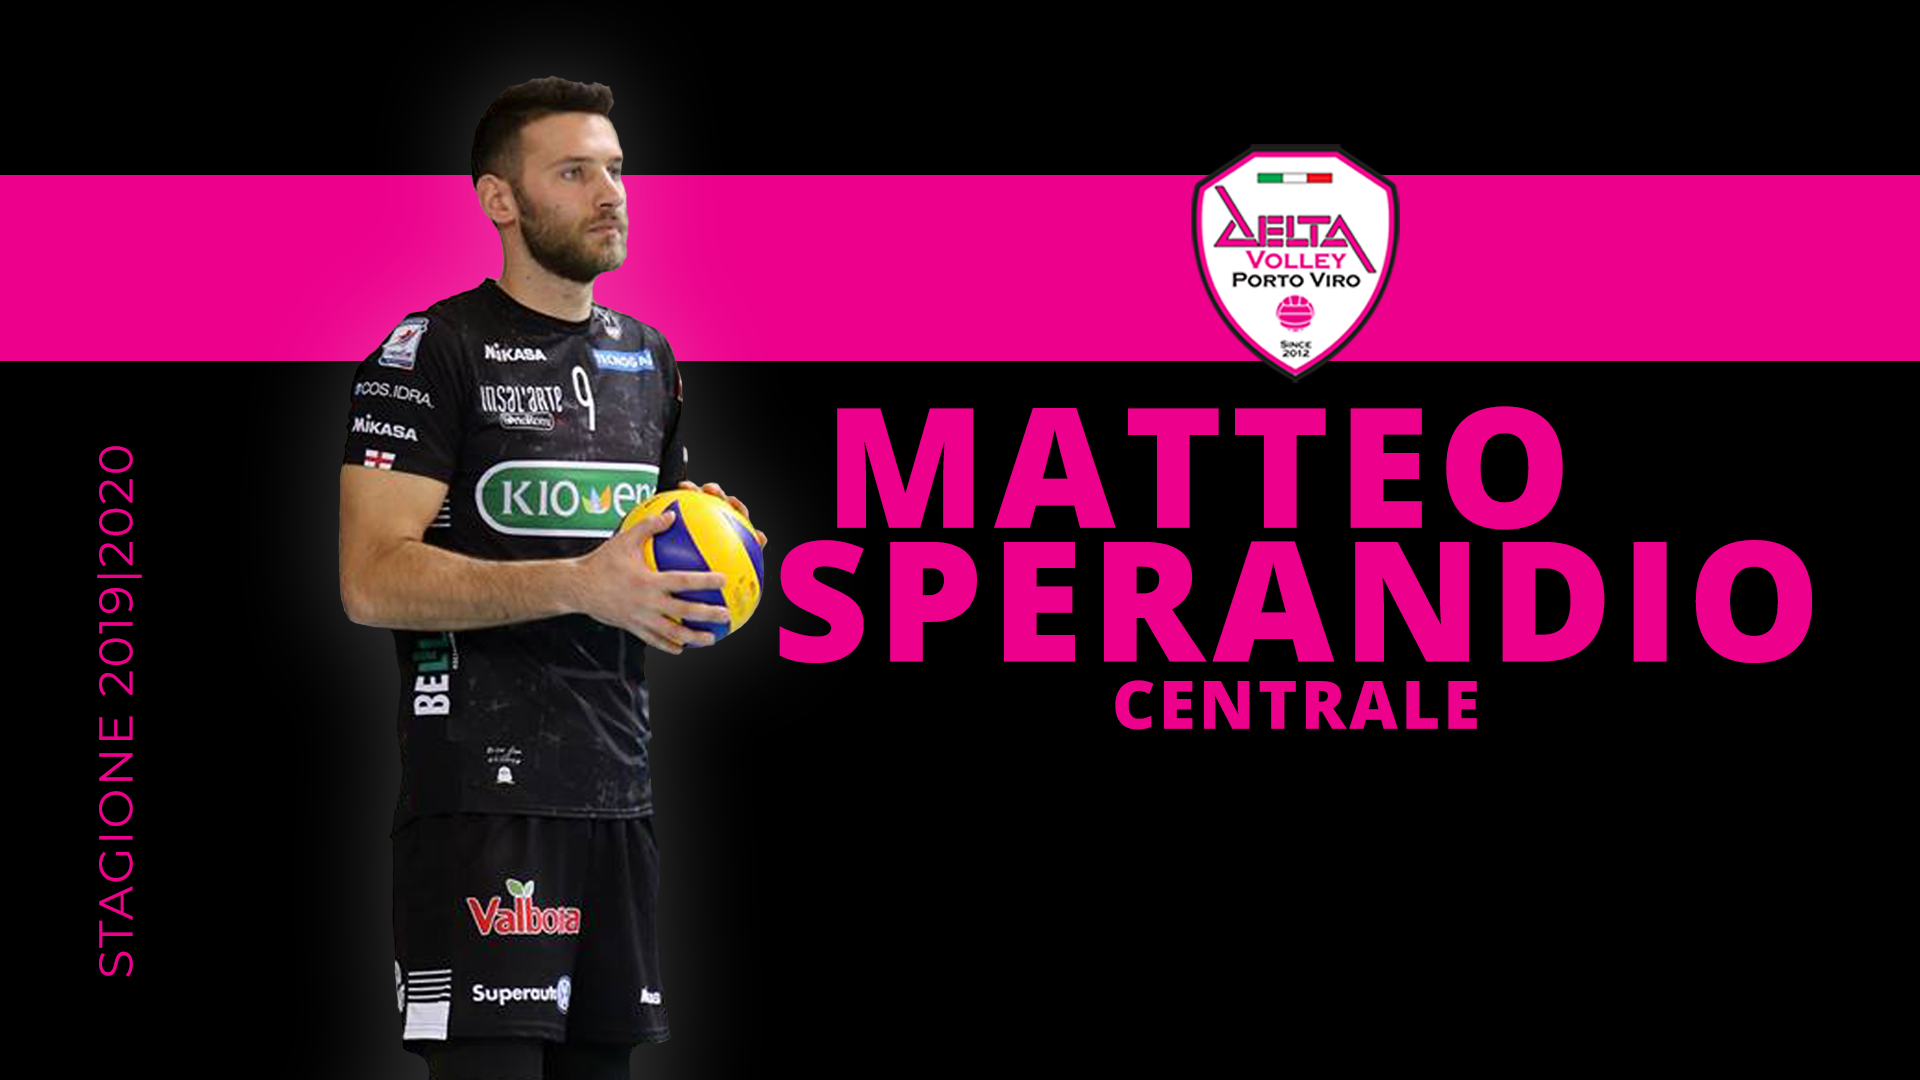 Matteo Sperandio